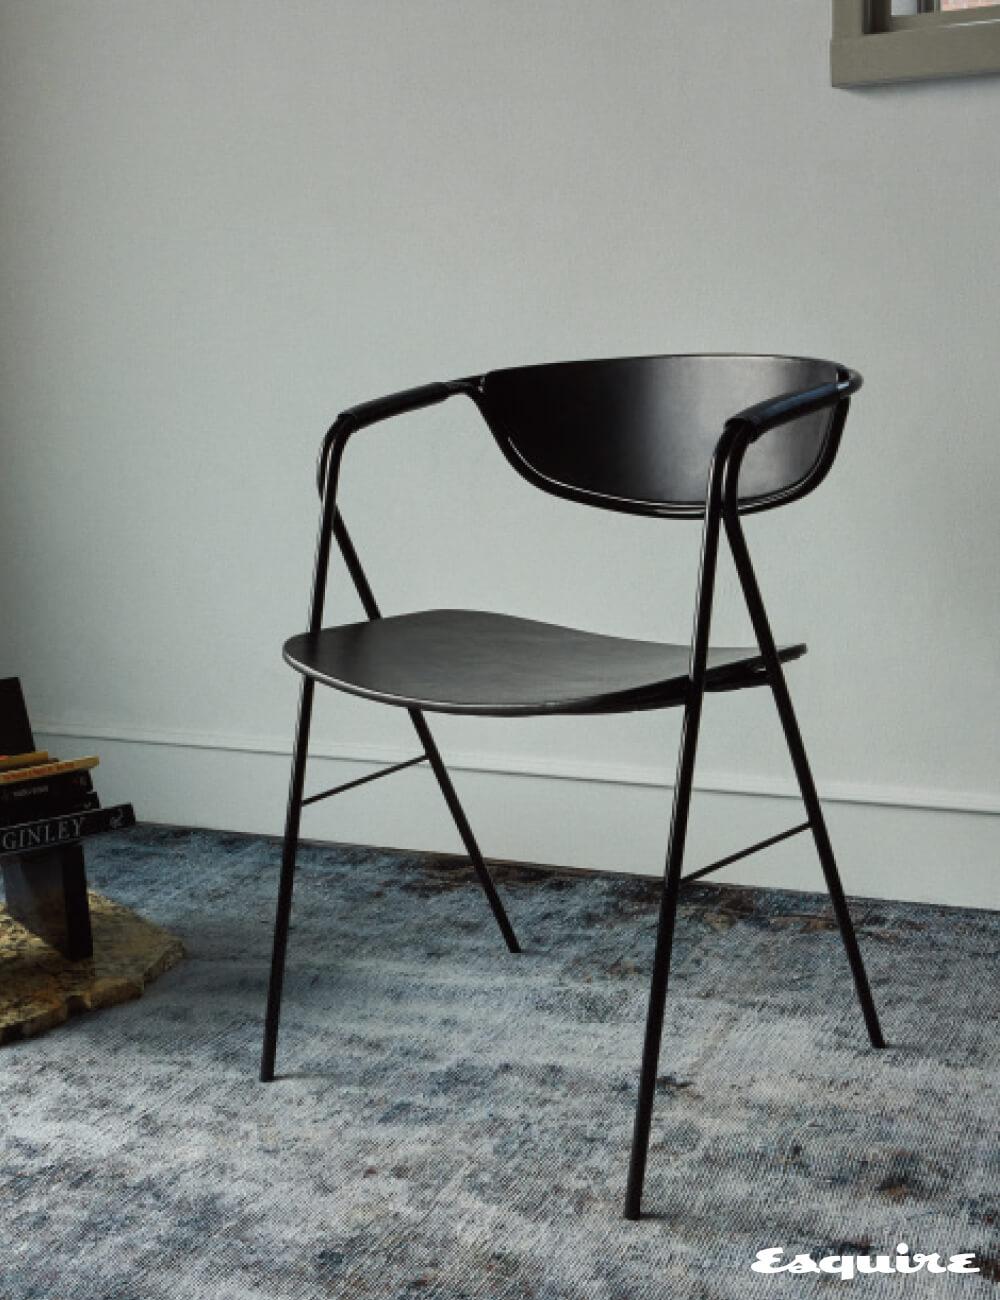 CANE chair by TAF Studio